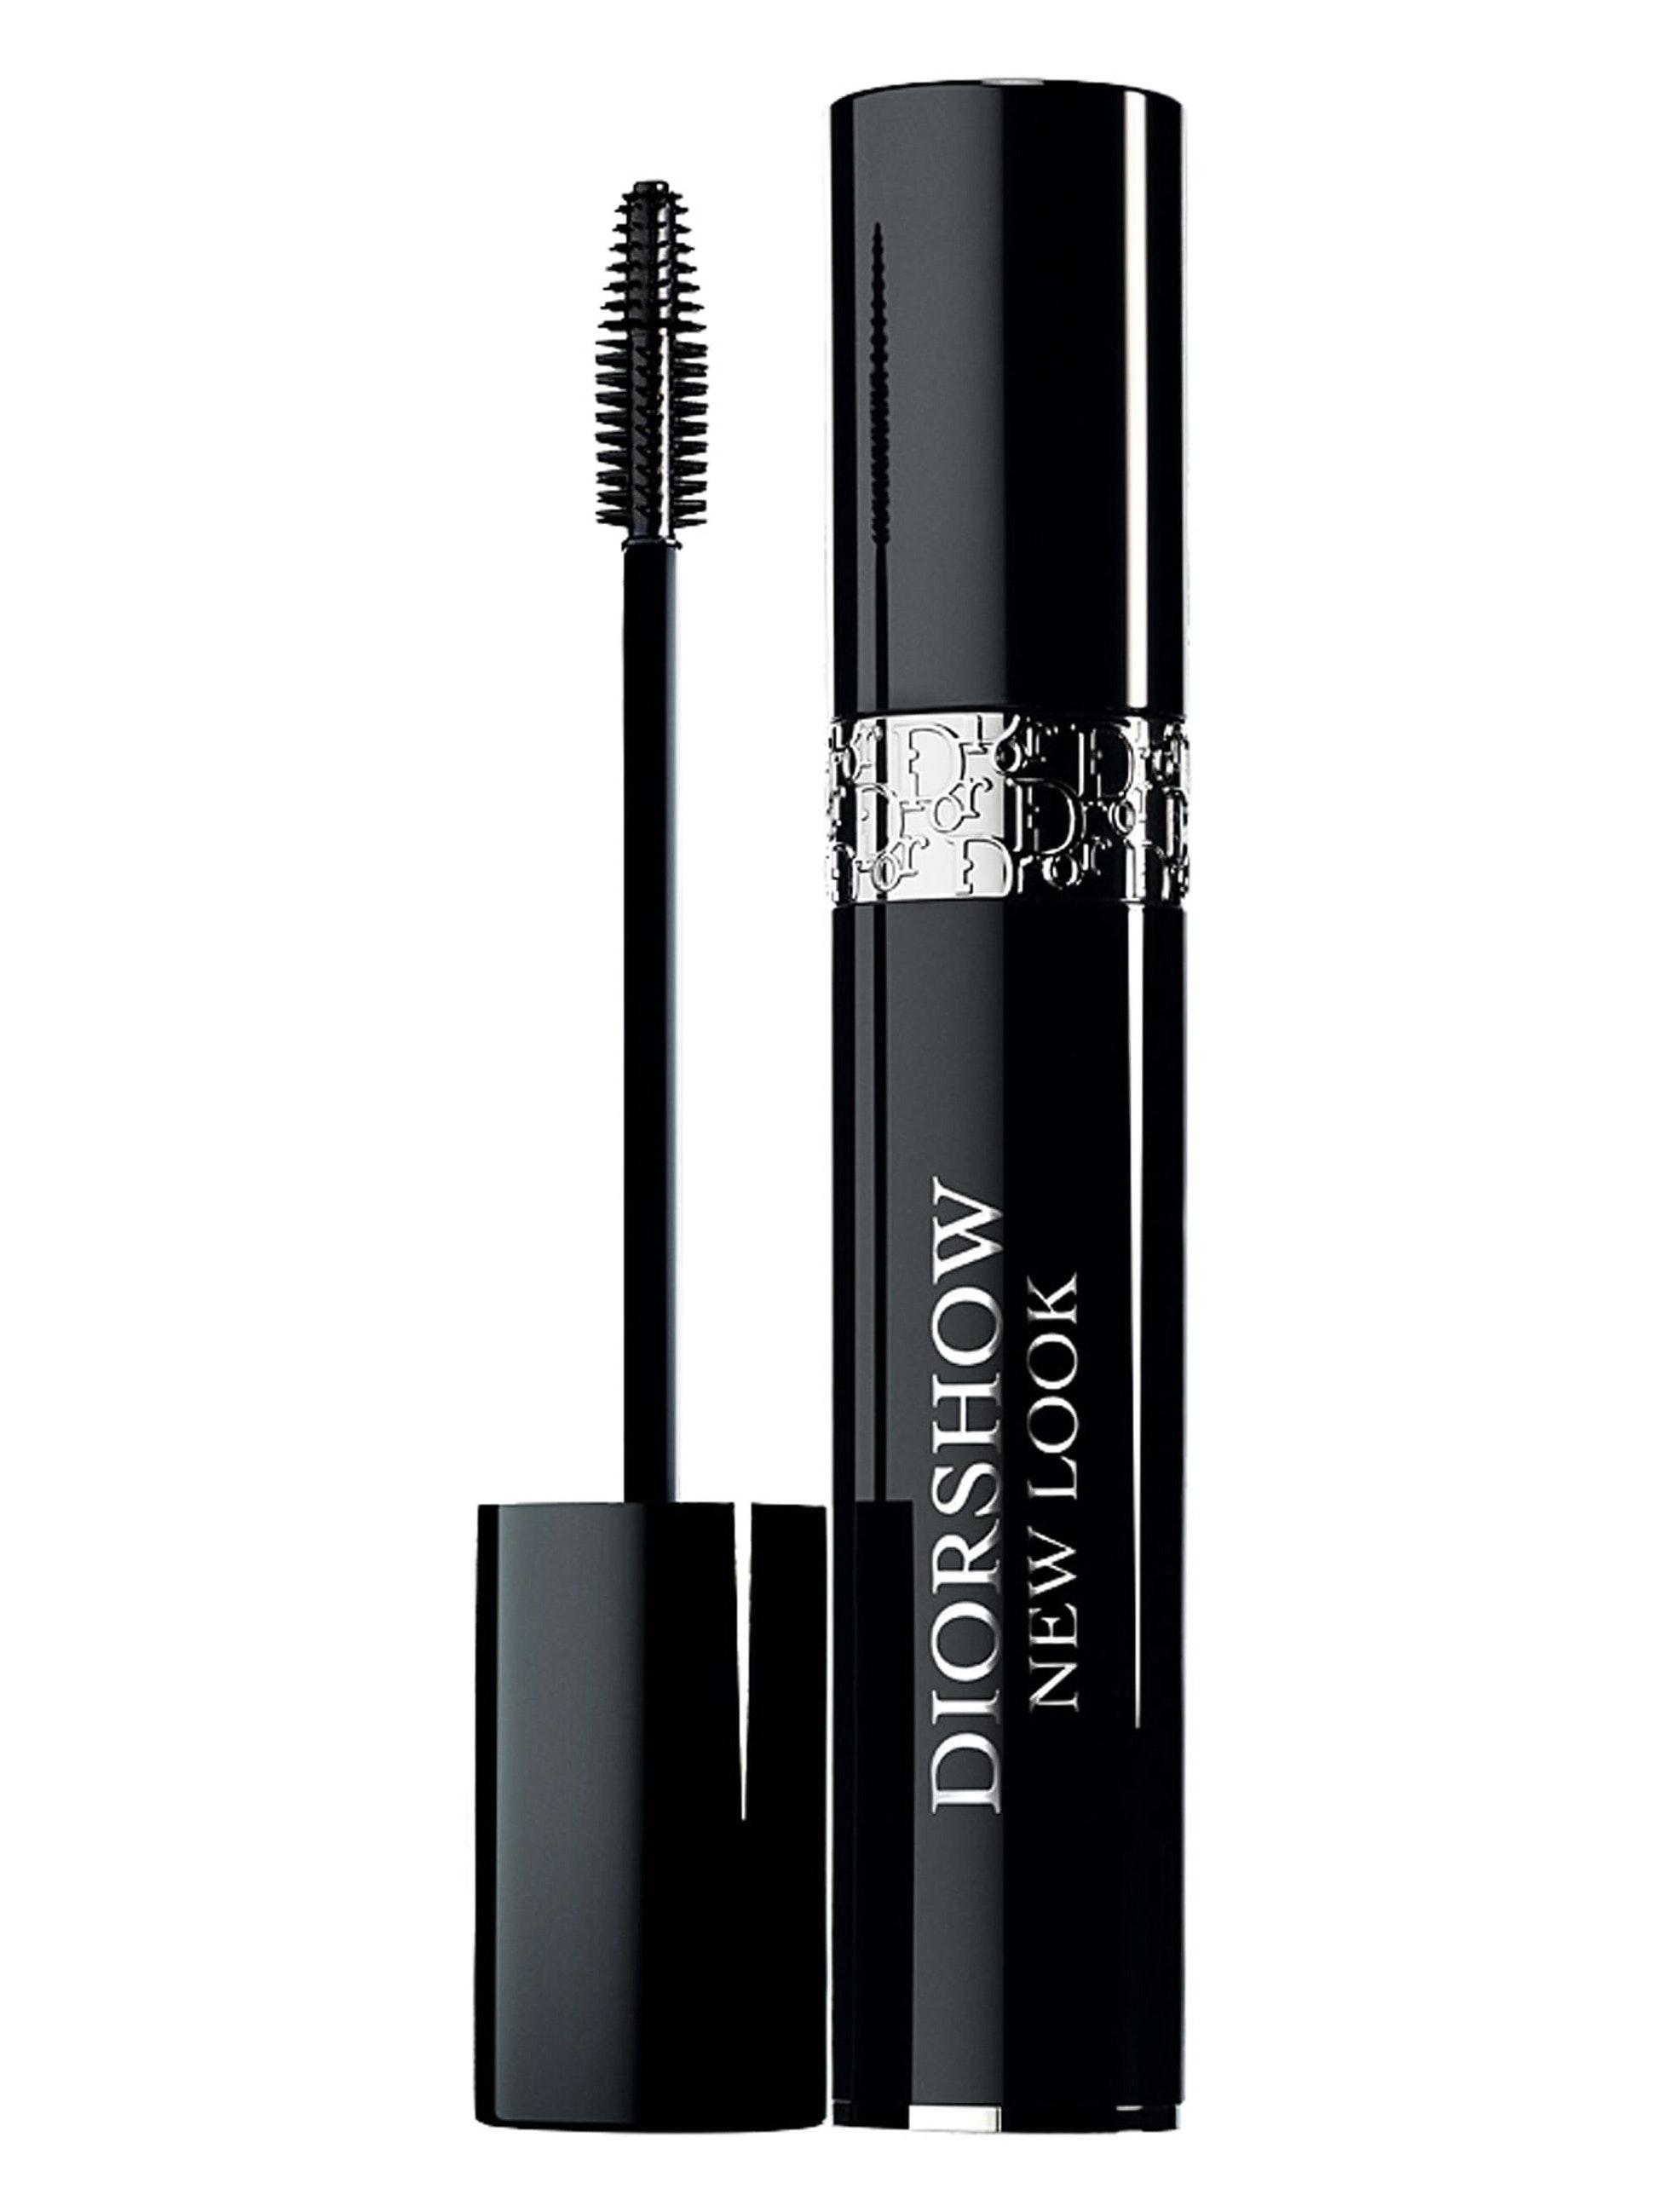 Christian Dior® Diorshow® New Look Mascara